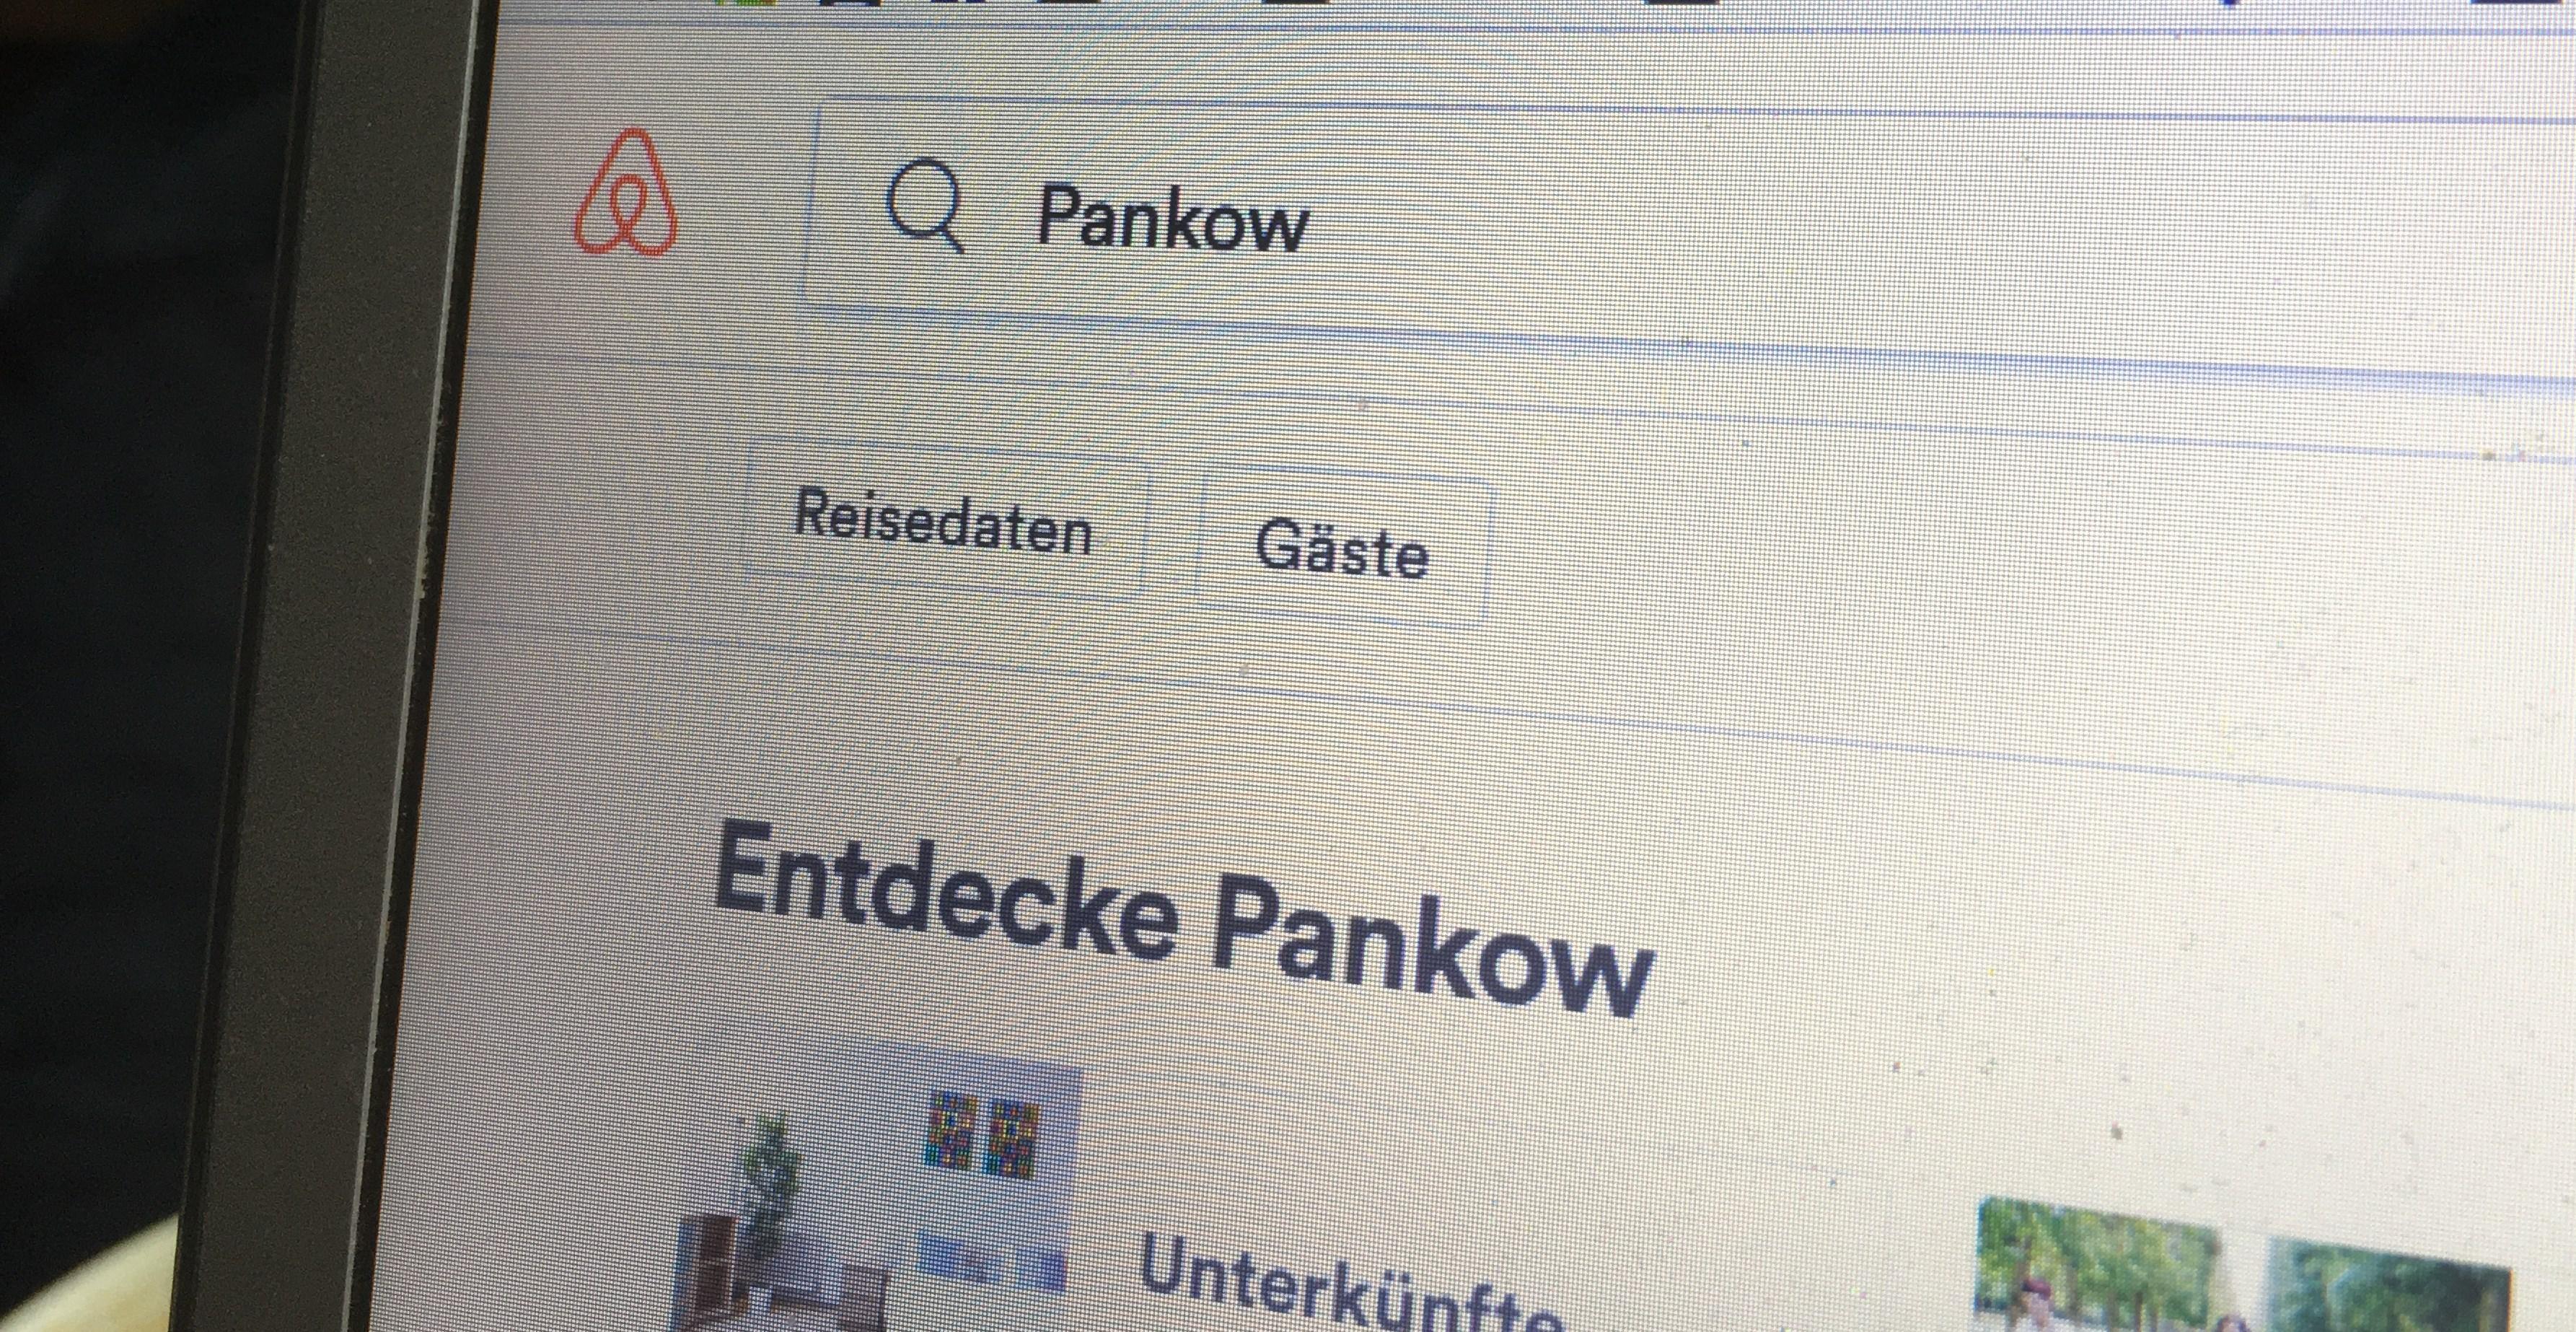 Streit Pankow Airbnb (Foto: Constanze Nauhaus)